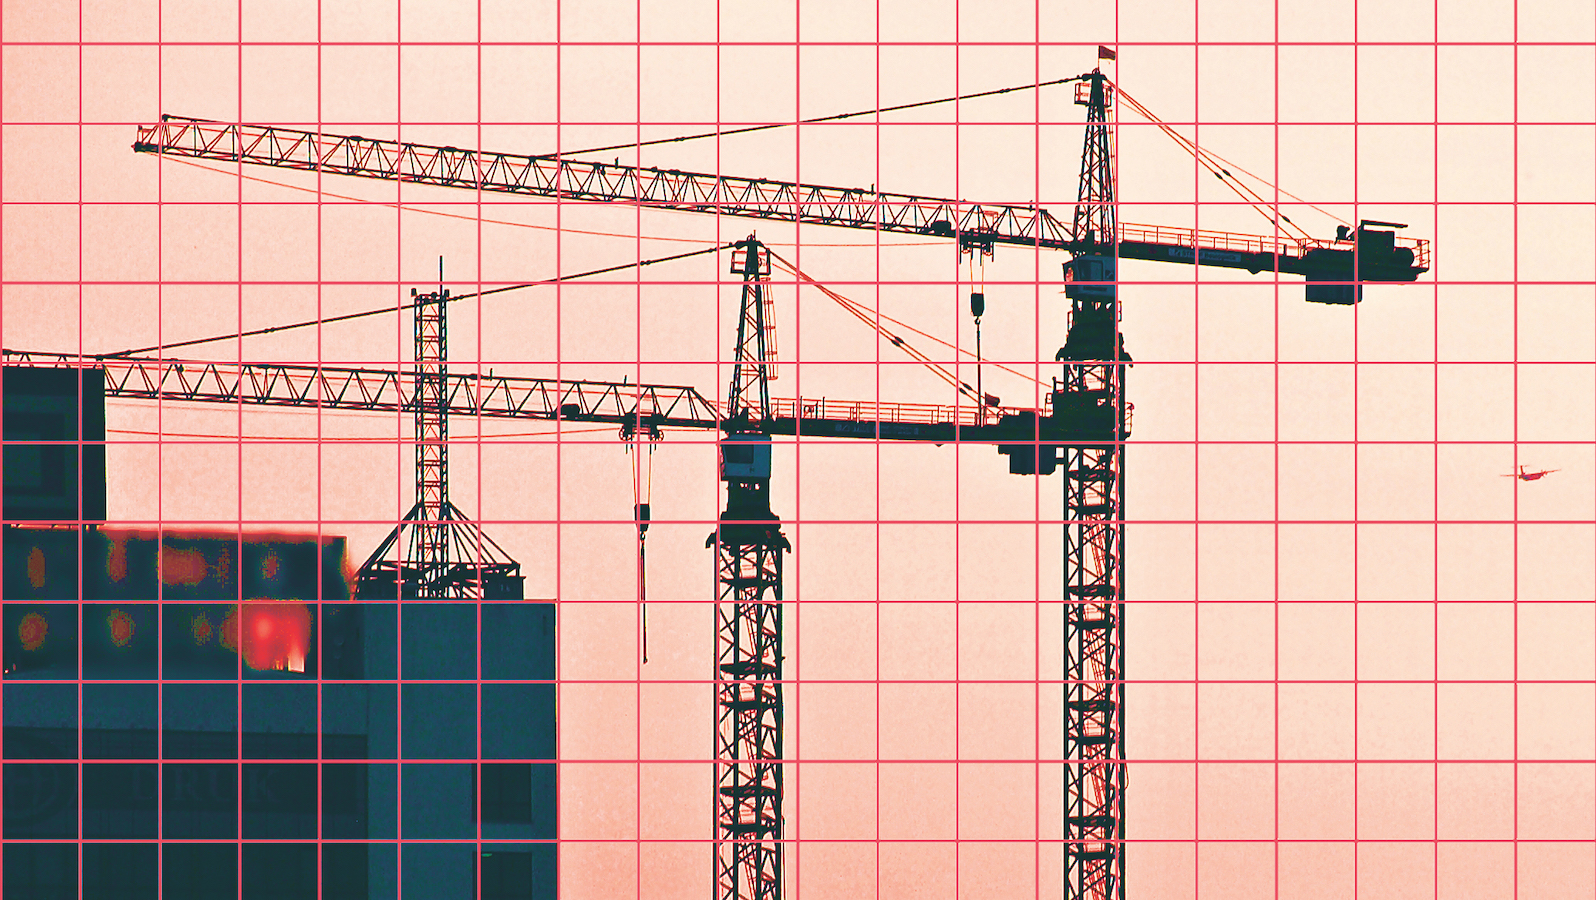 Cranes on construction site. Image: Dreamstime